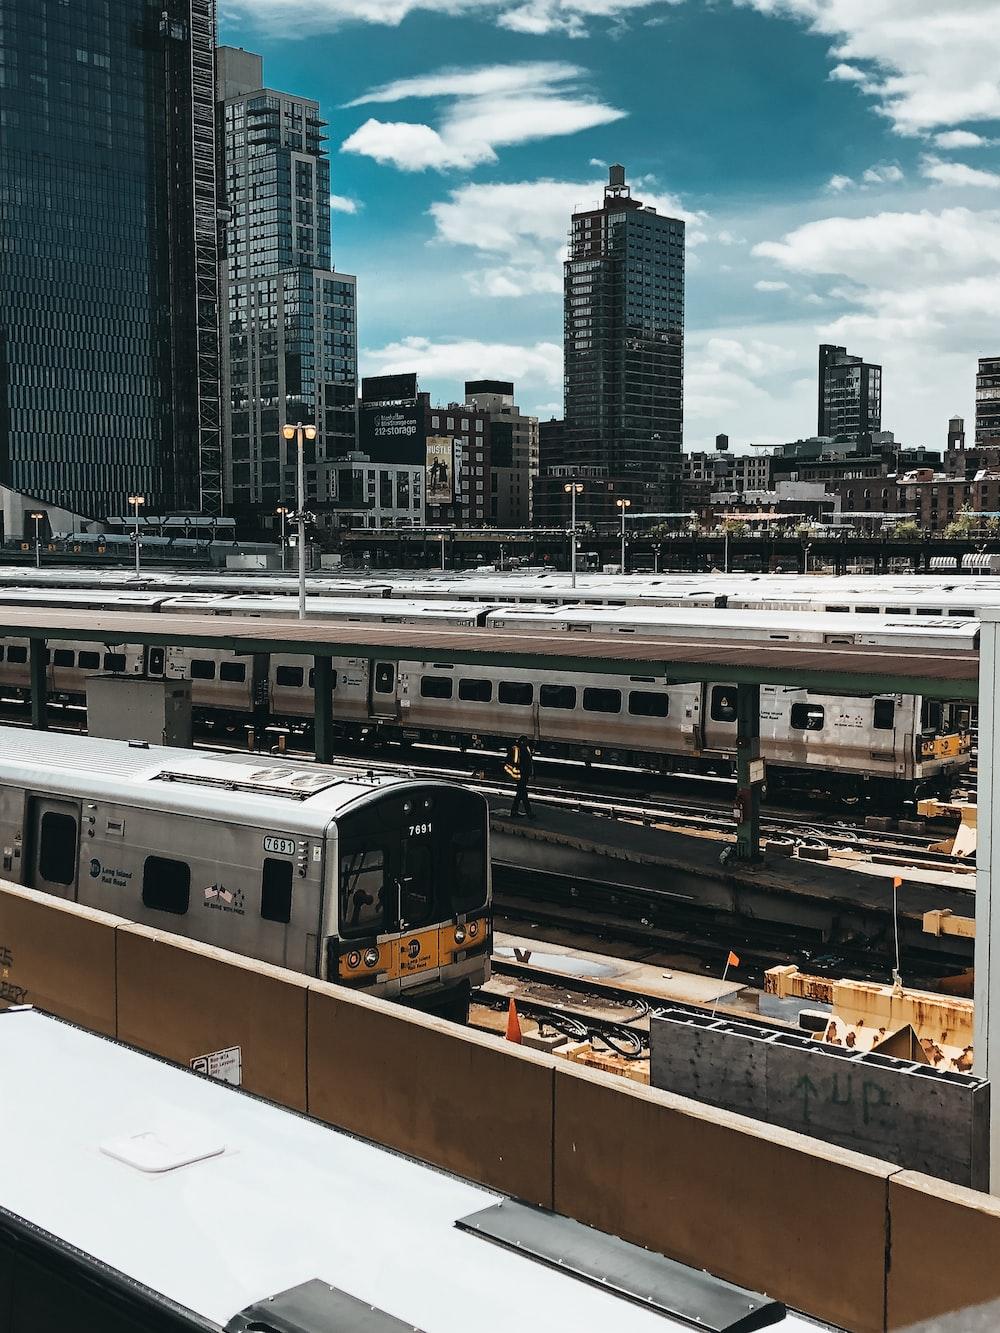 gray and black train on railway